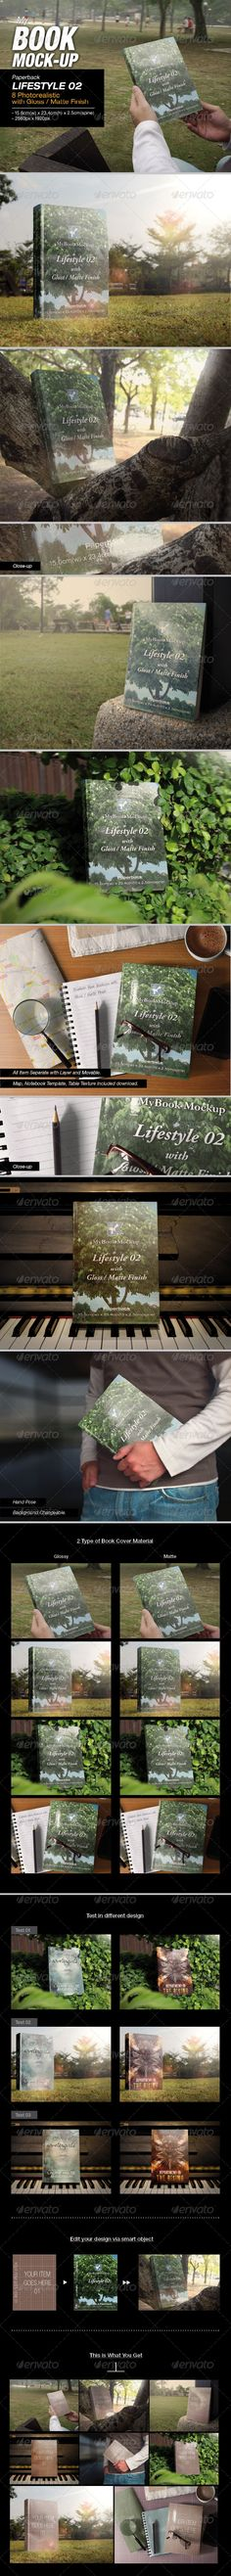 Lifestyle 02 Mock-up - Books Print